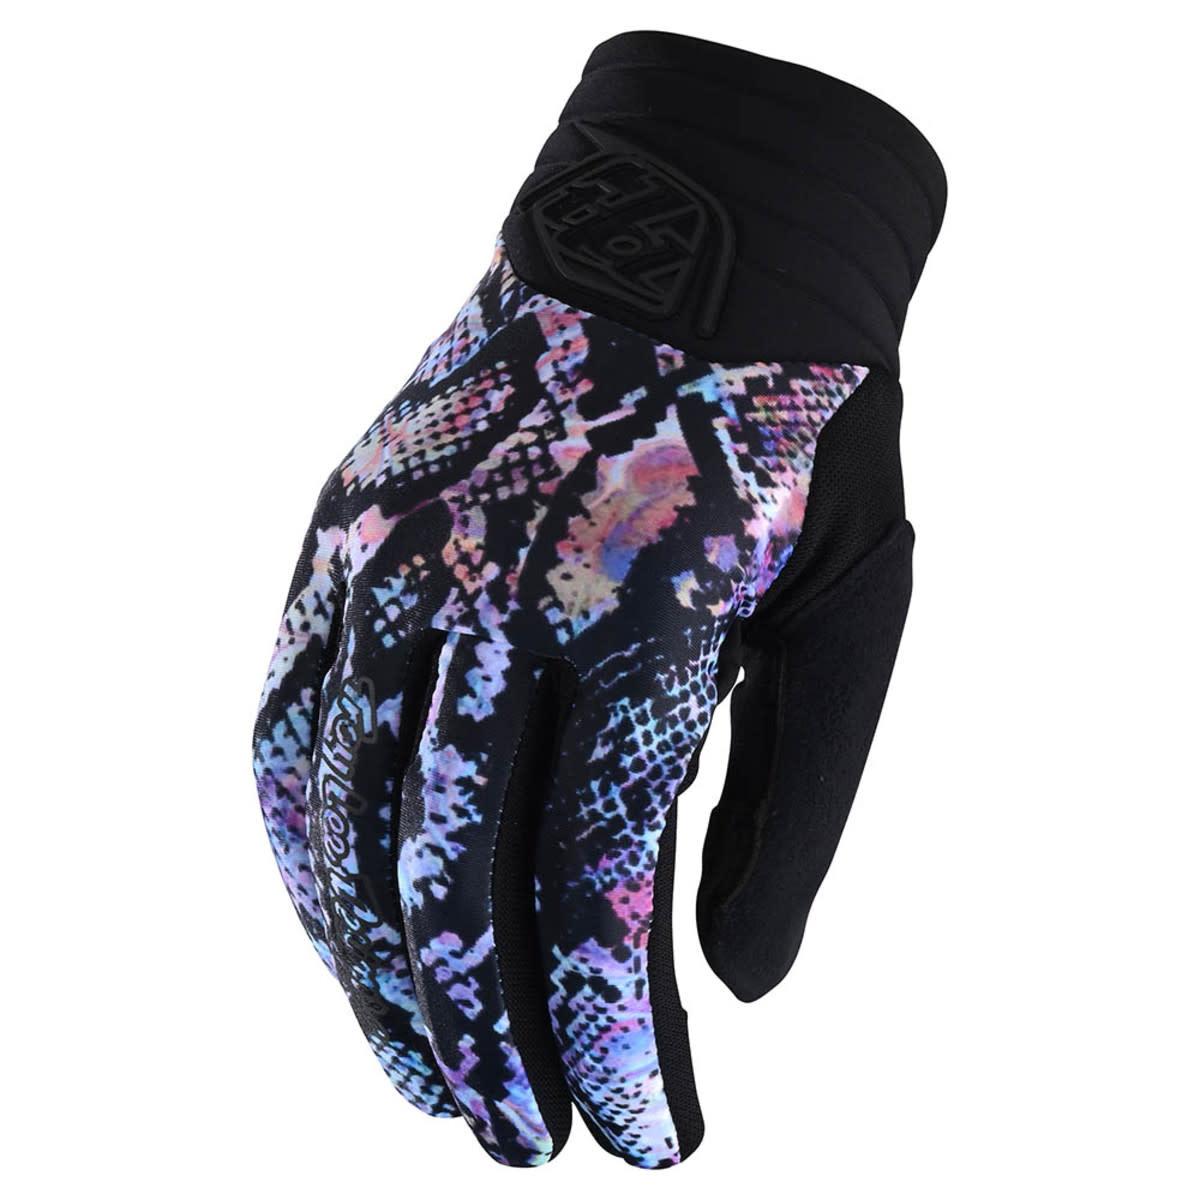 Troy Lee Designs Luxe Woman Long Glove